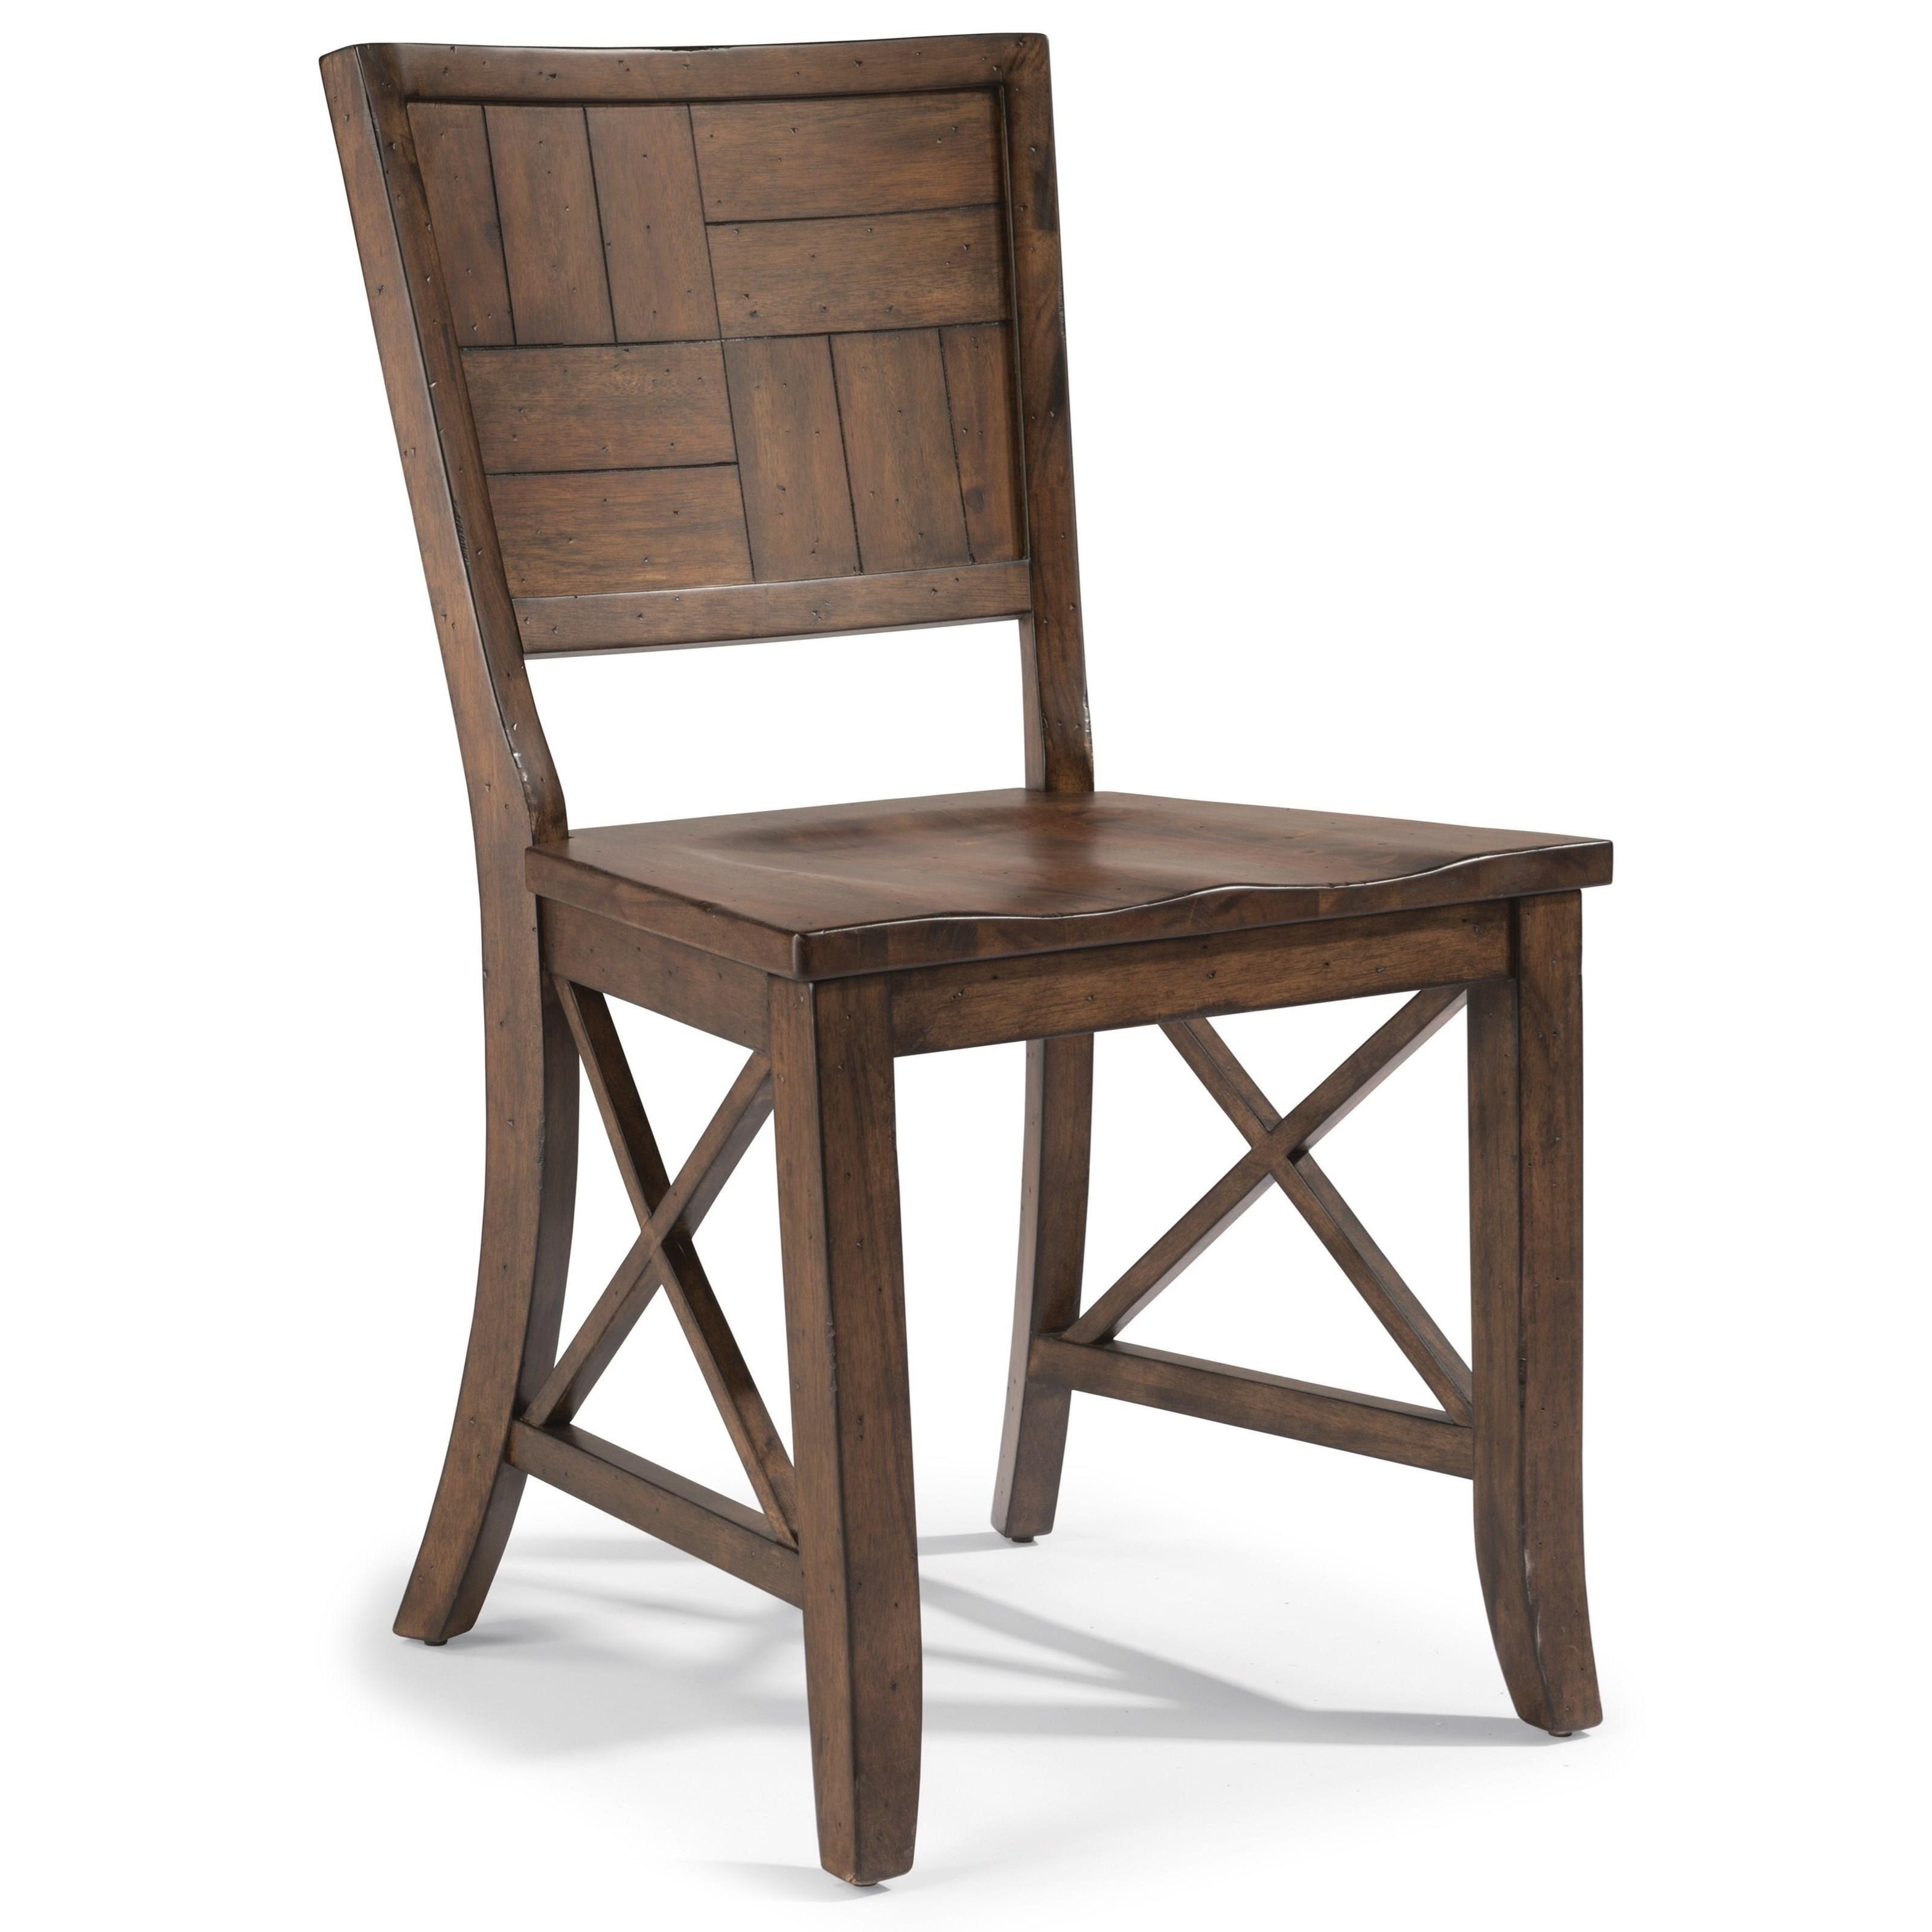 Flexsteel Wynwood Collection Carpenter Side Chair - Item Number: W6722-840